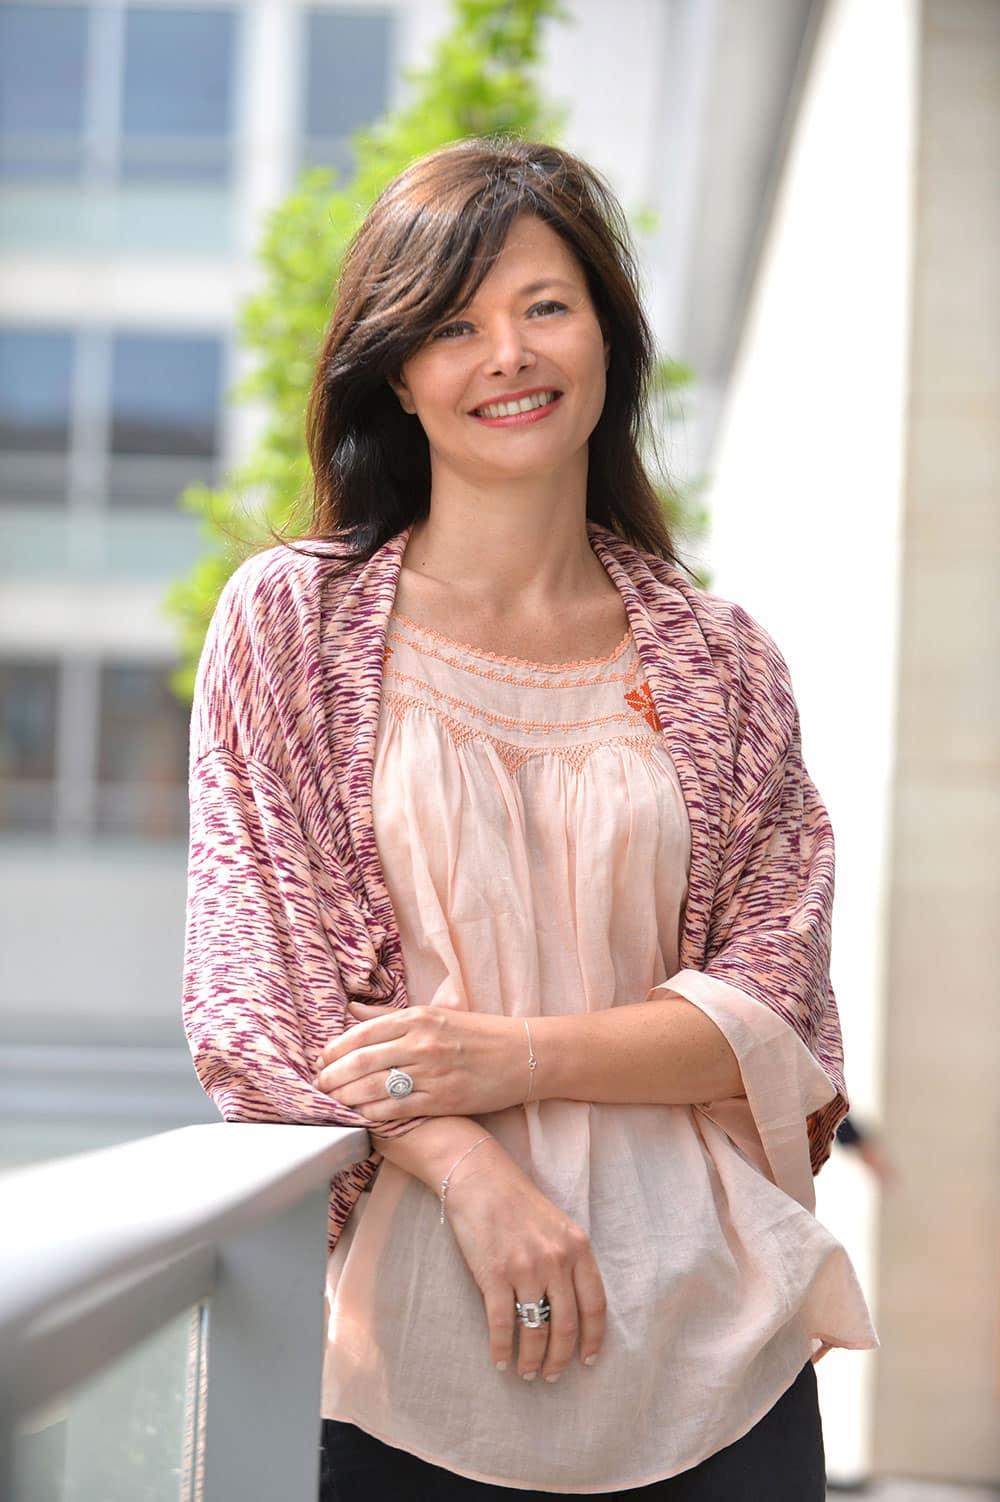 Nathalie Depetro, MAPIC Director at Reed MIDEM